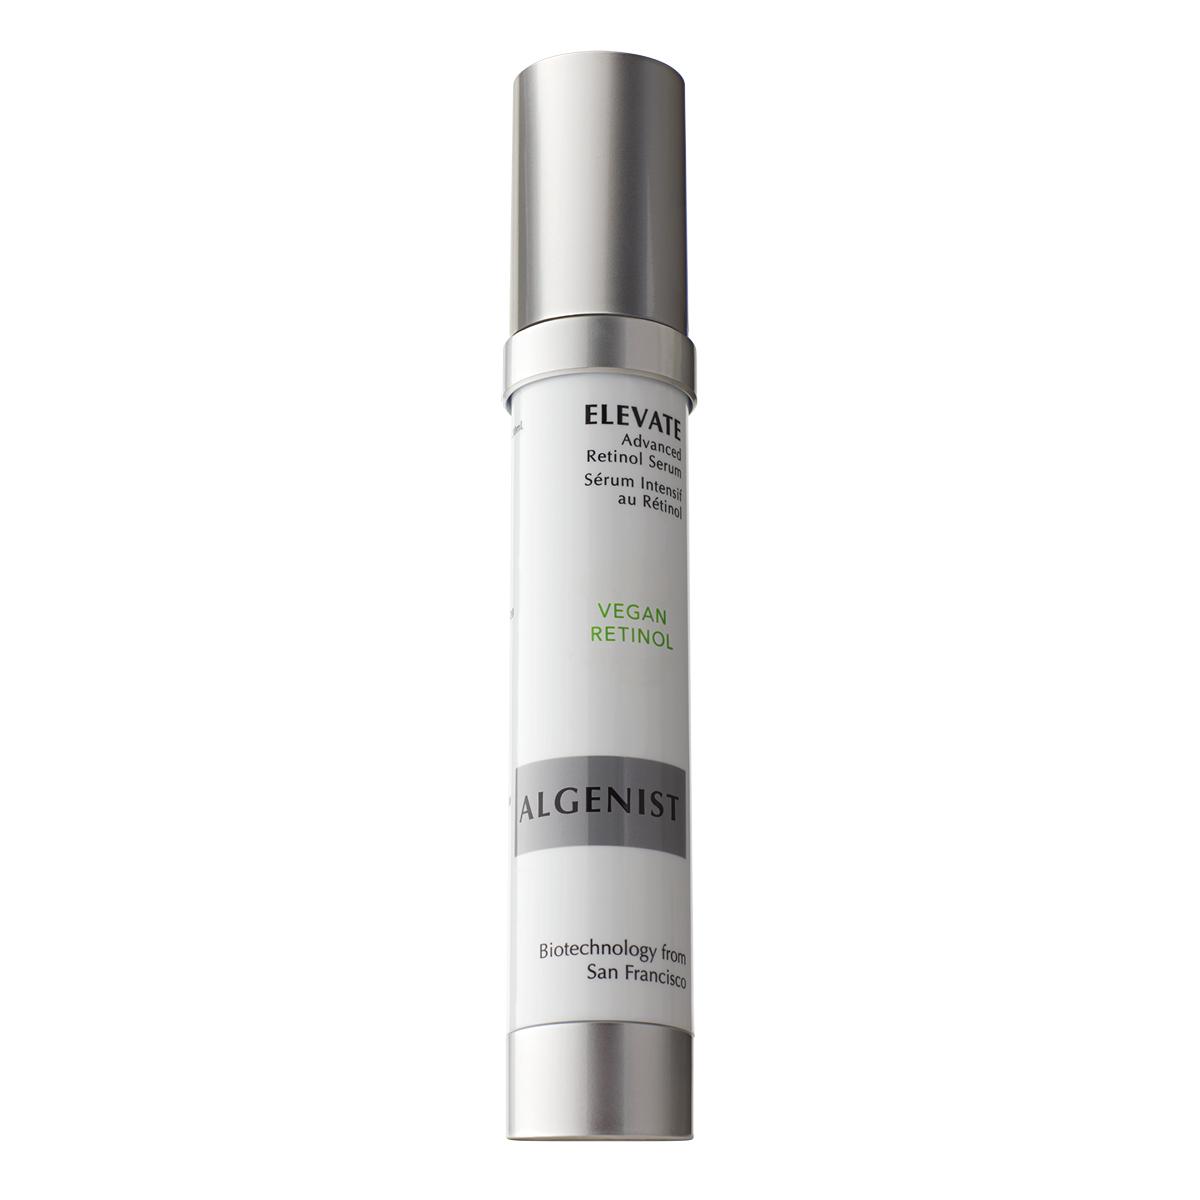 Algenist Elevate Retinol Firming and Lifting Serum, 30 ml